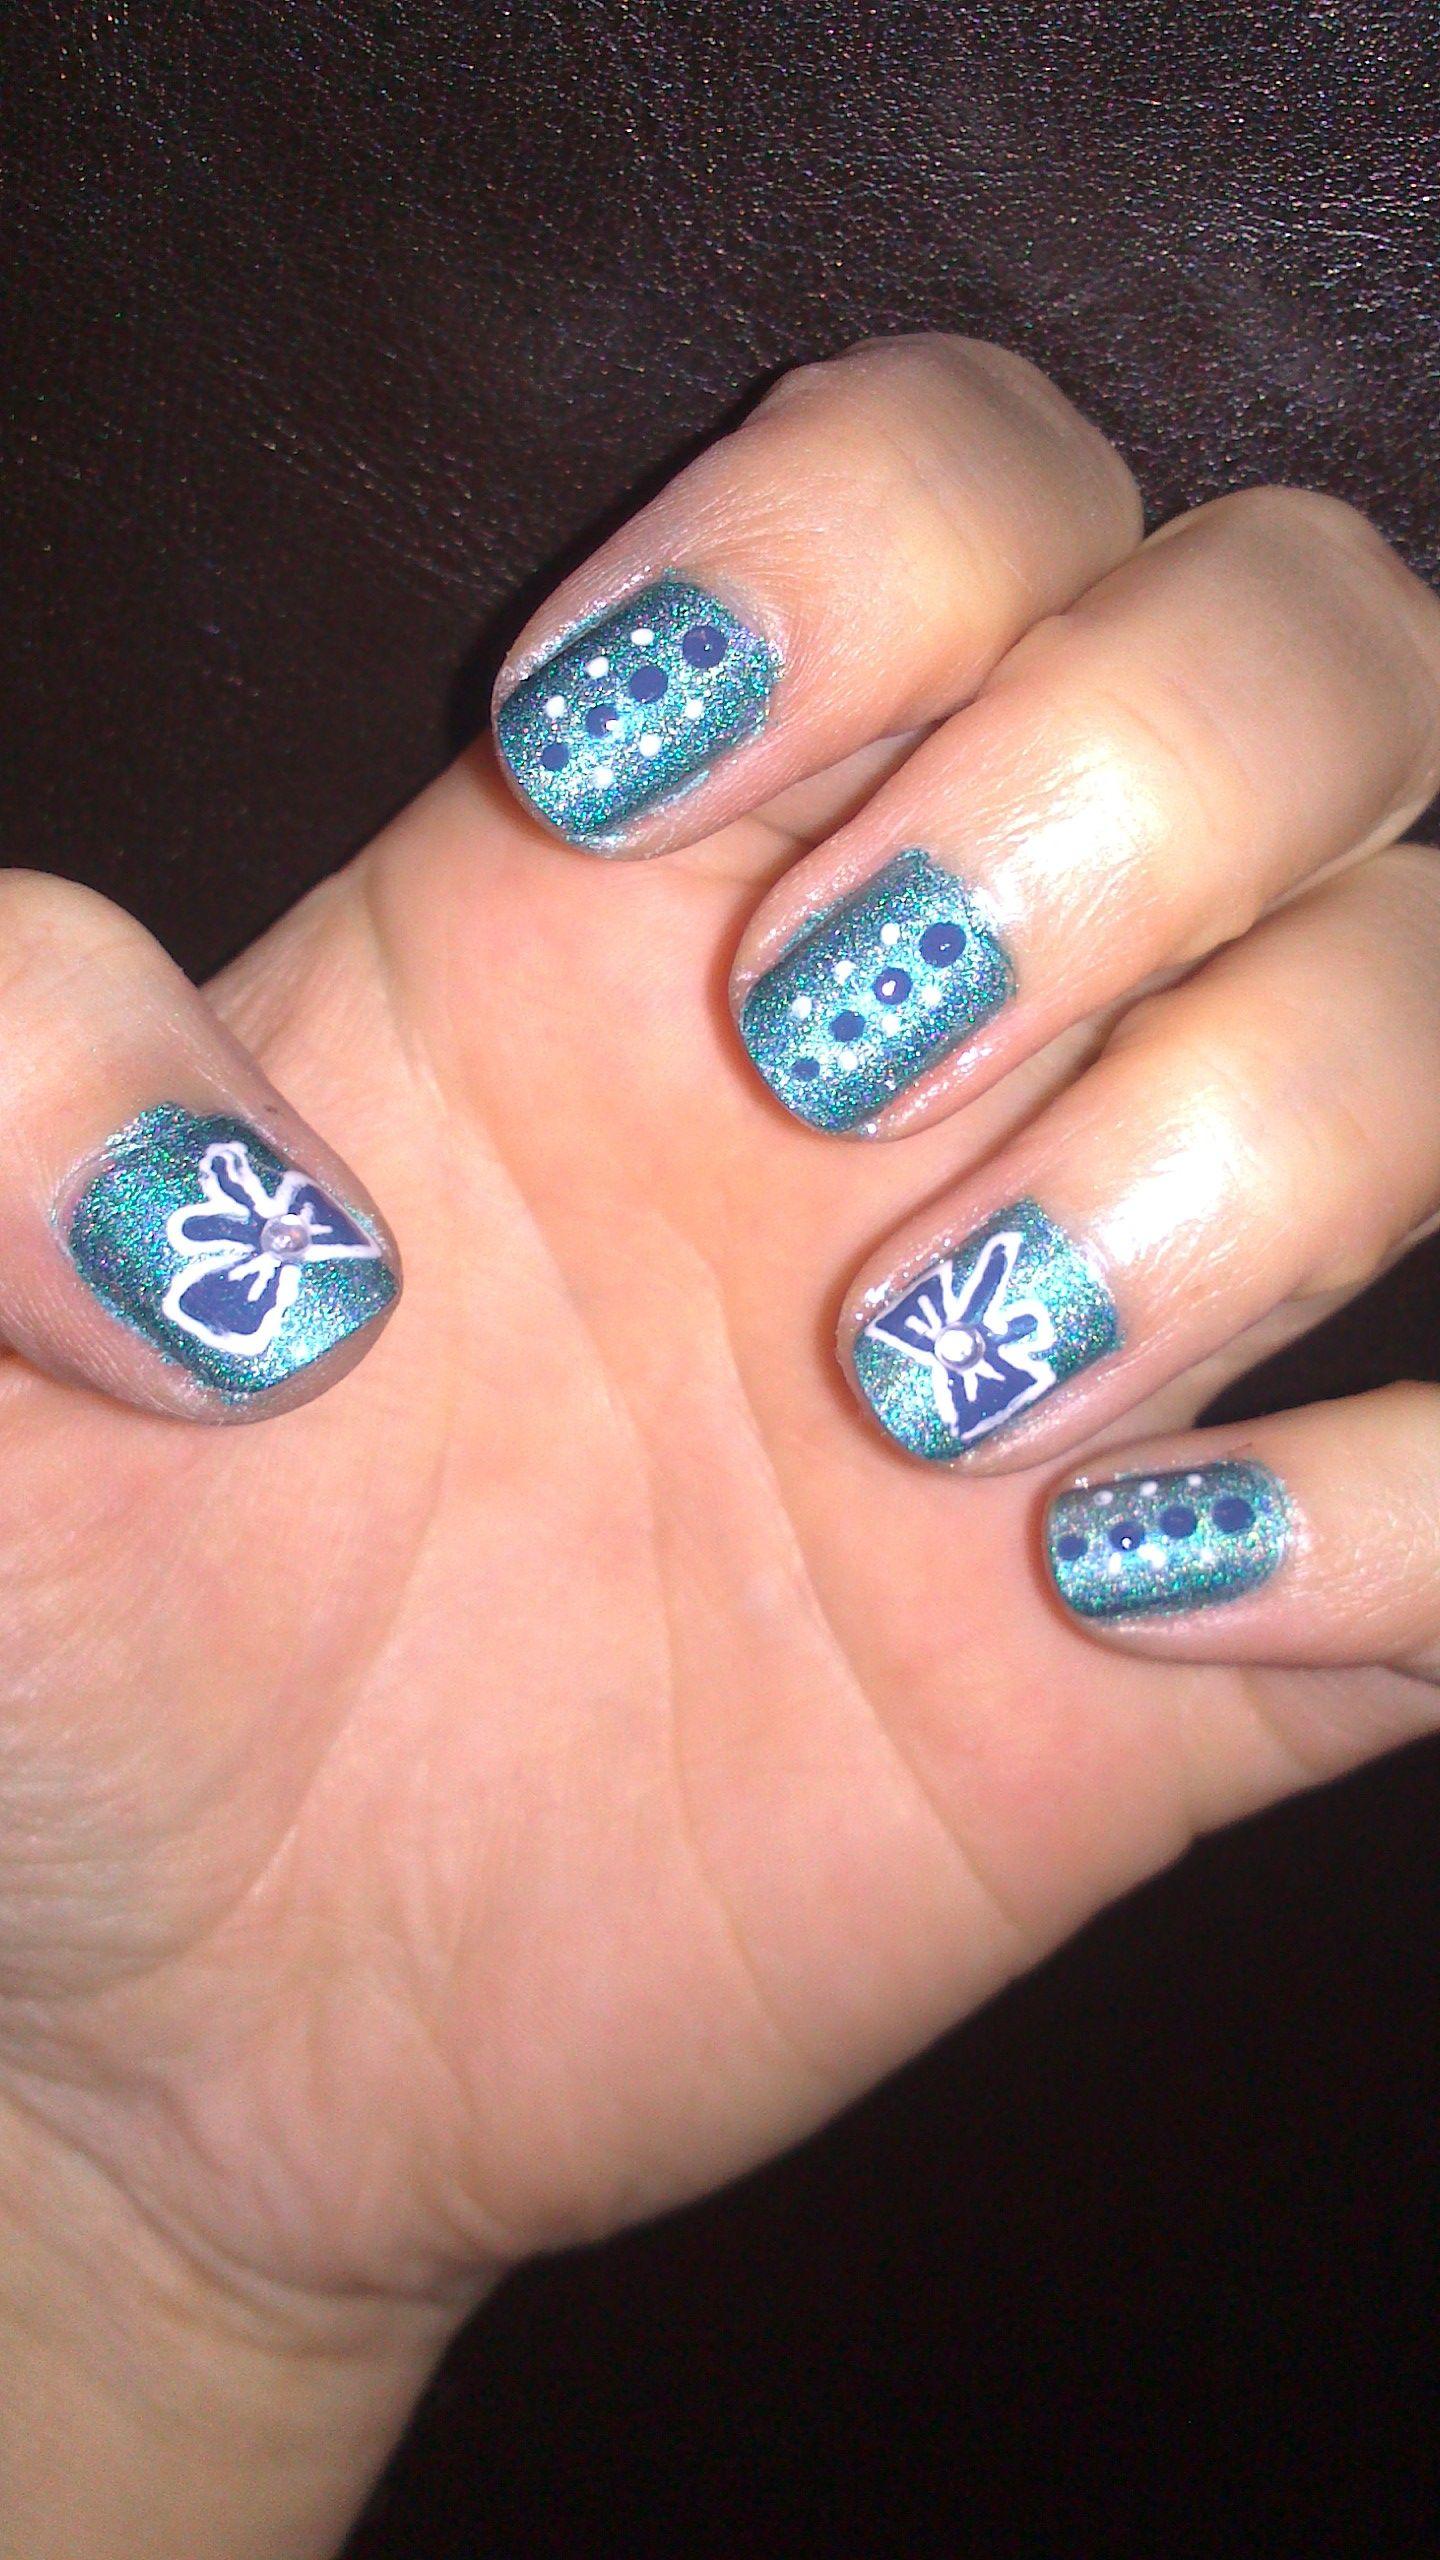 nails #nail #art #stripes #candy #dots #circus #cute #easy #beginner ...